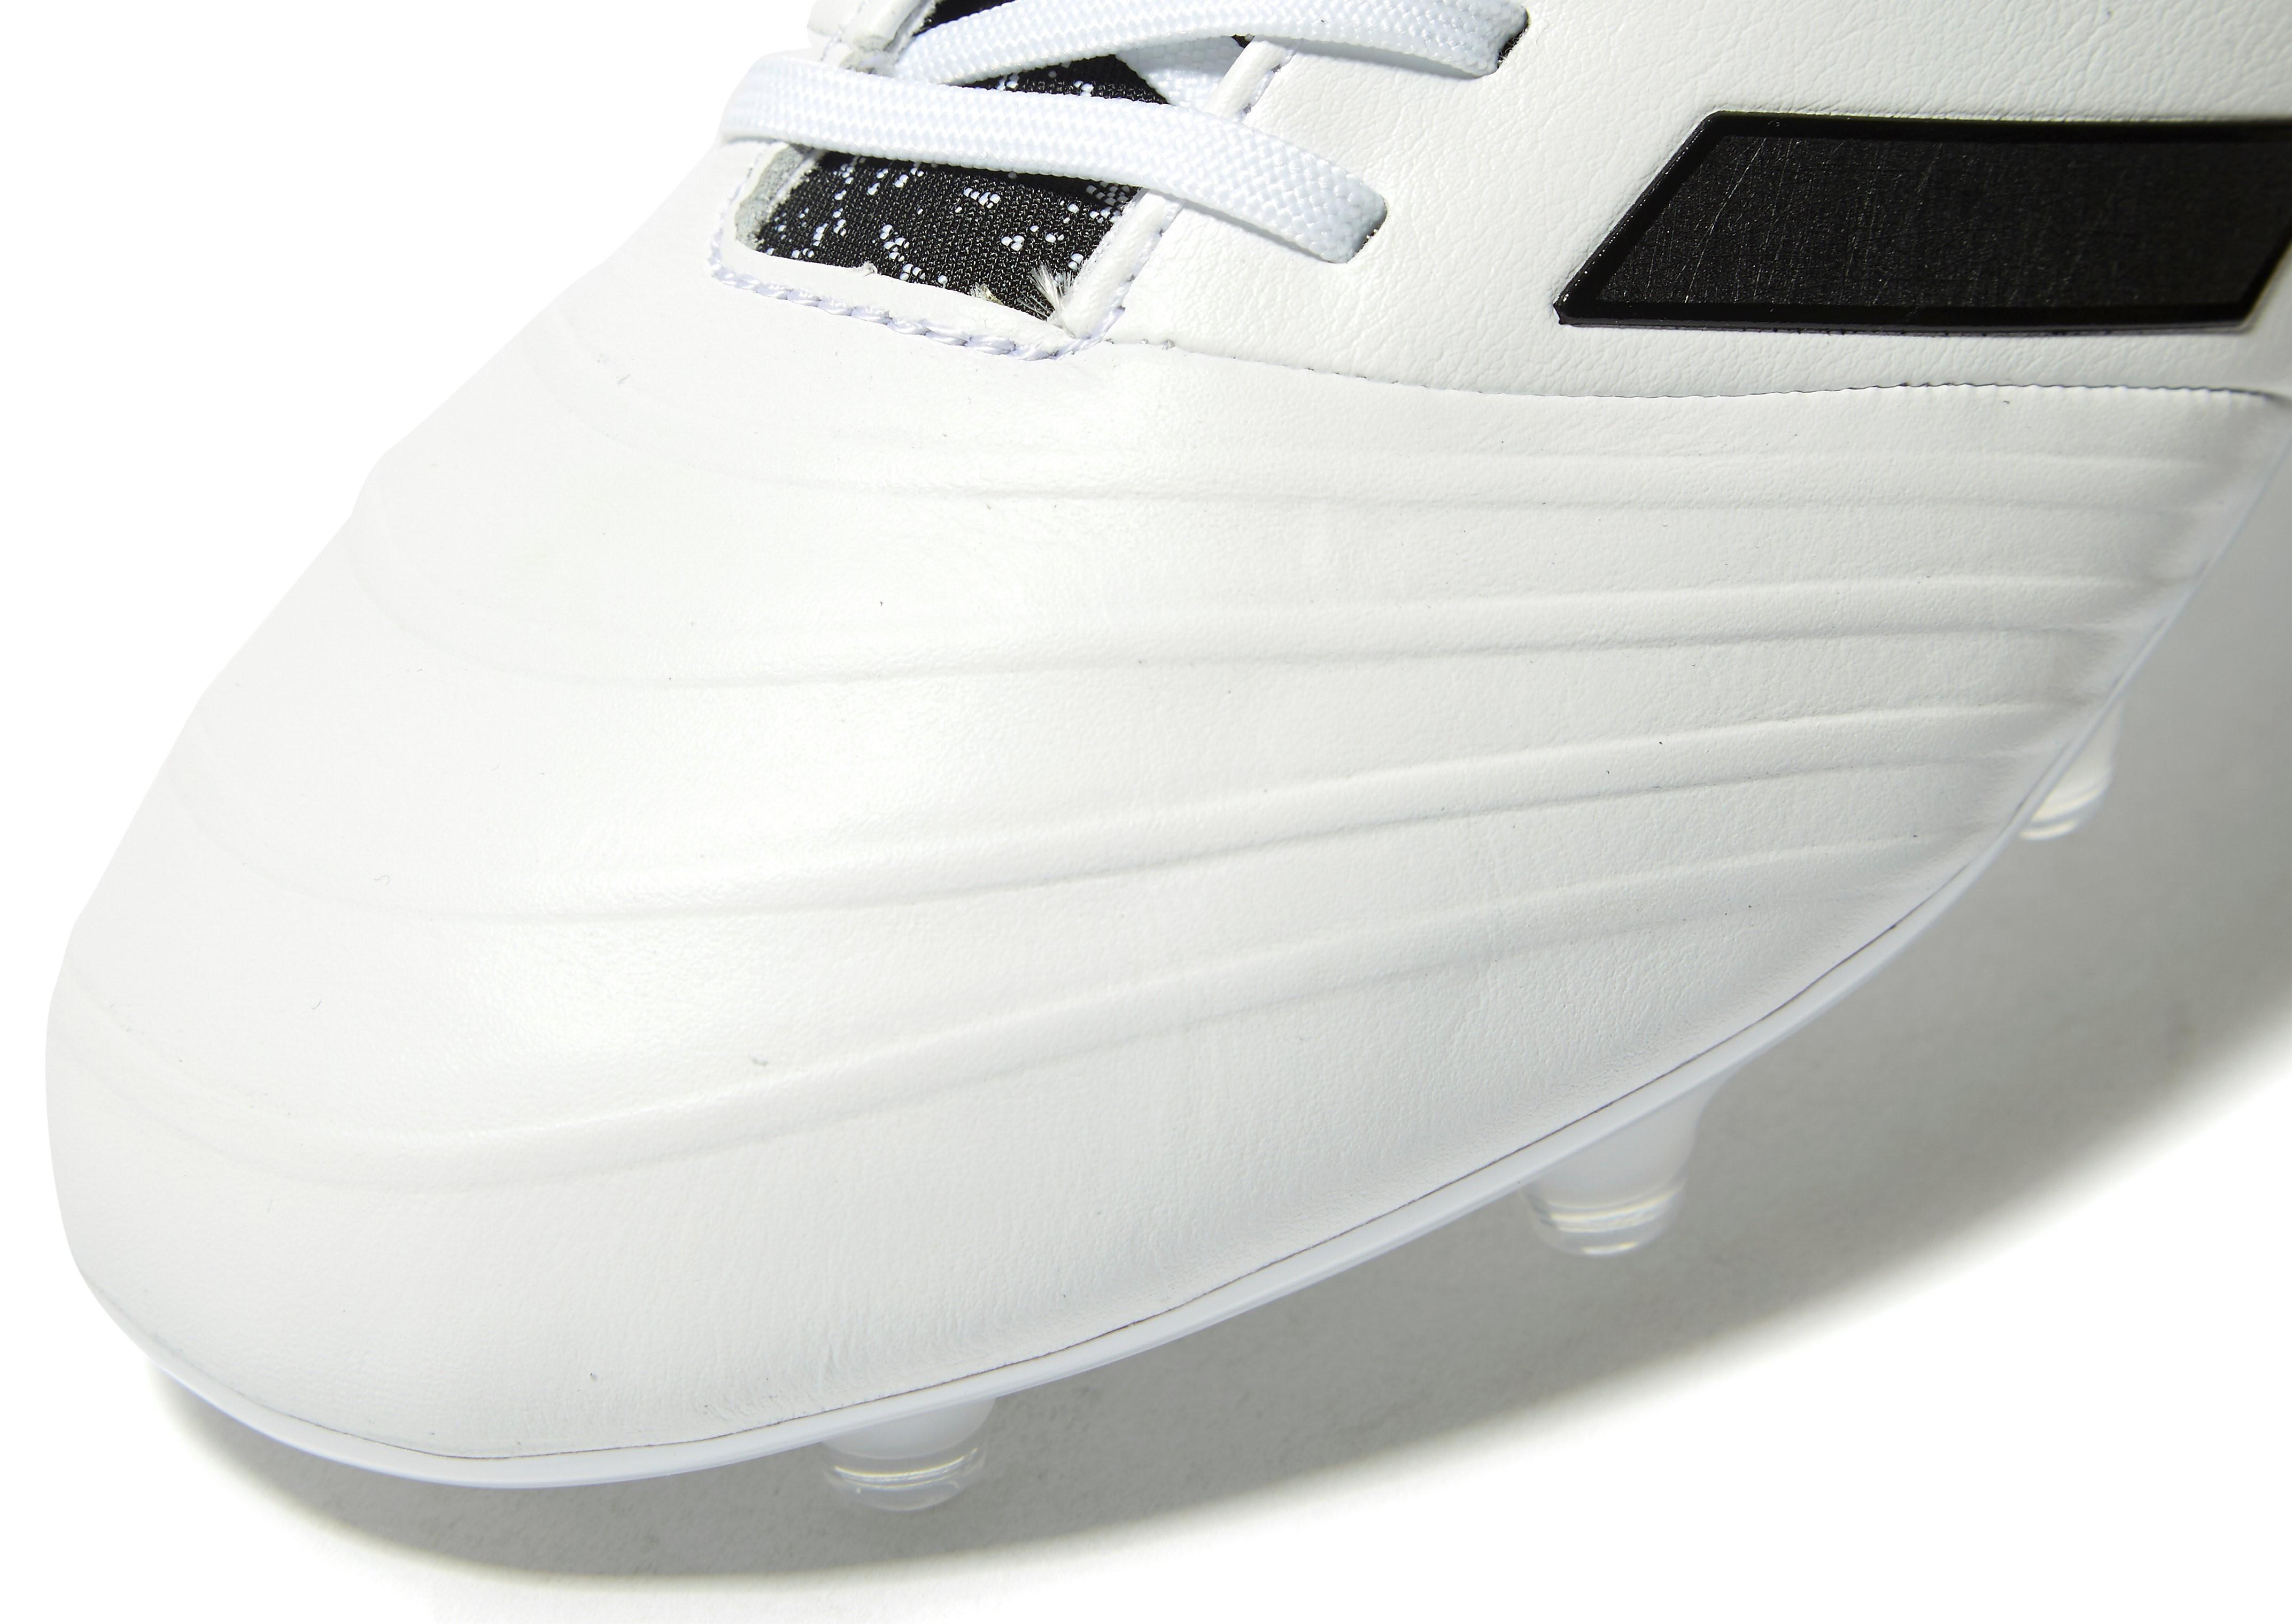 adidas SkyStalker Copa 18.2 FG